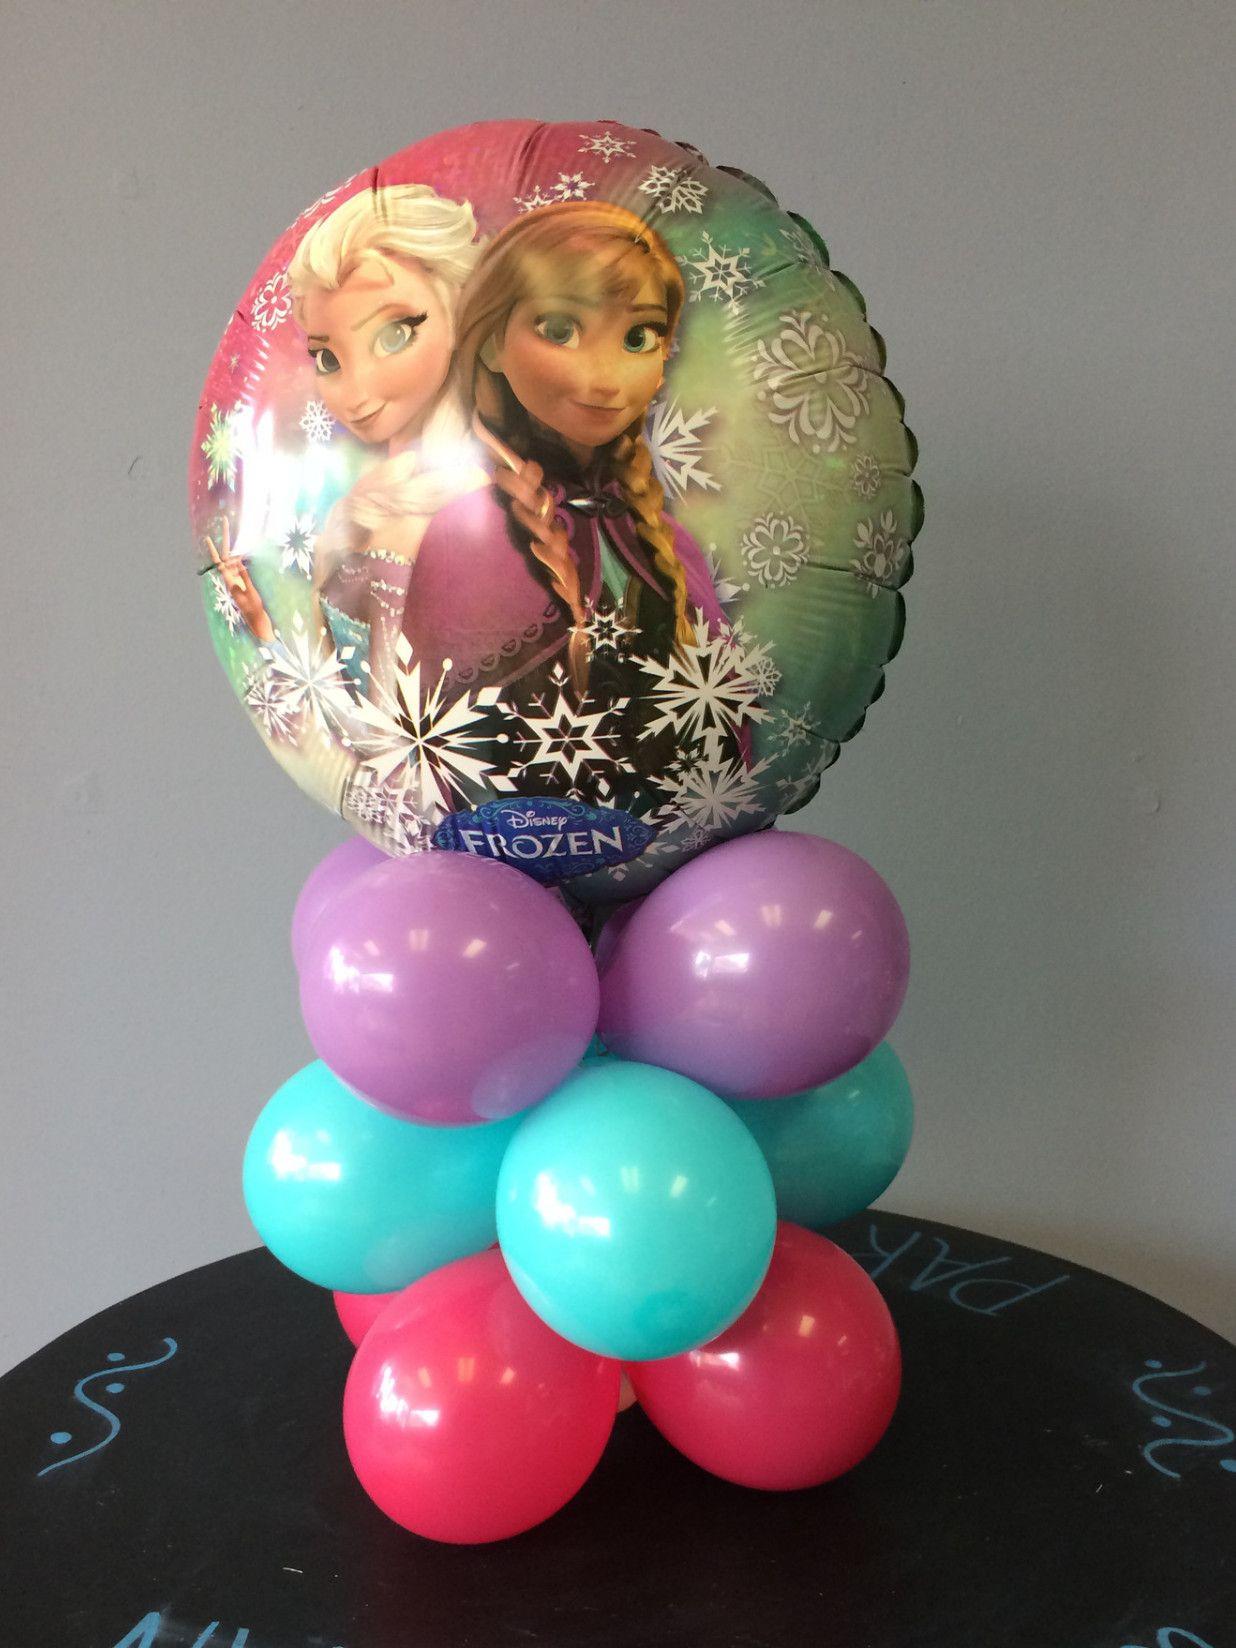 Filled latex balloon seems